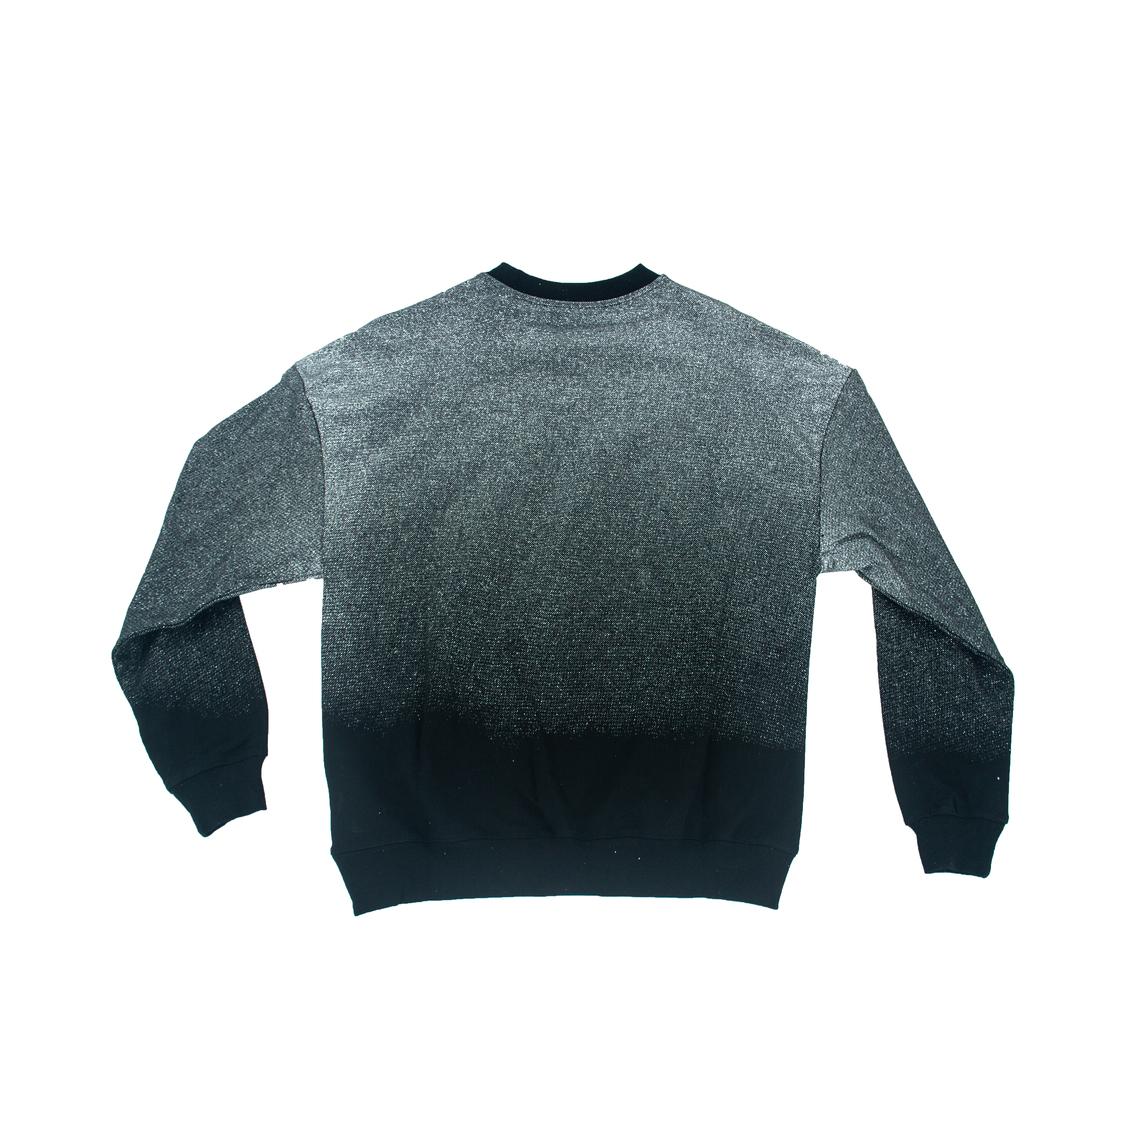 Áo nỉ Givenchy kim tuyến - đen